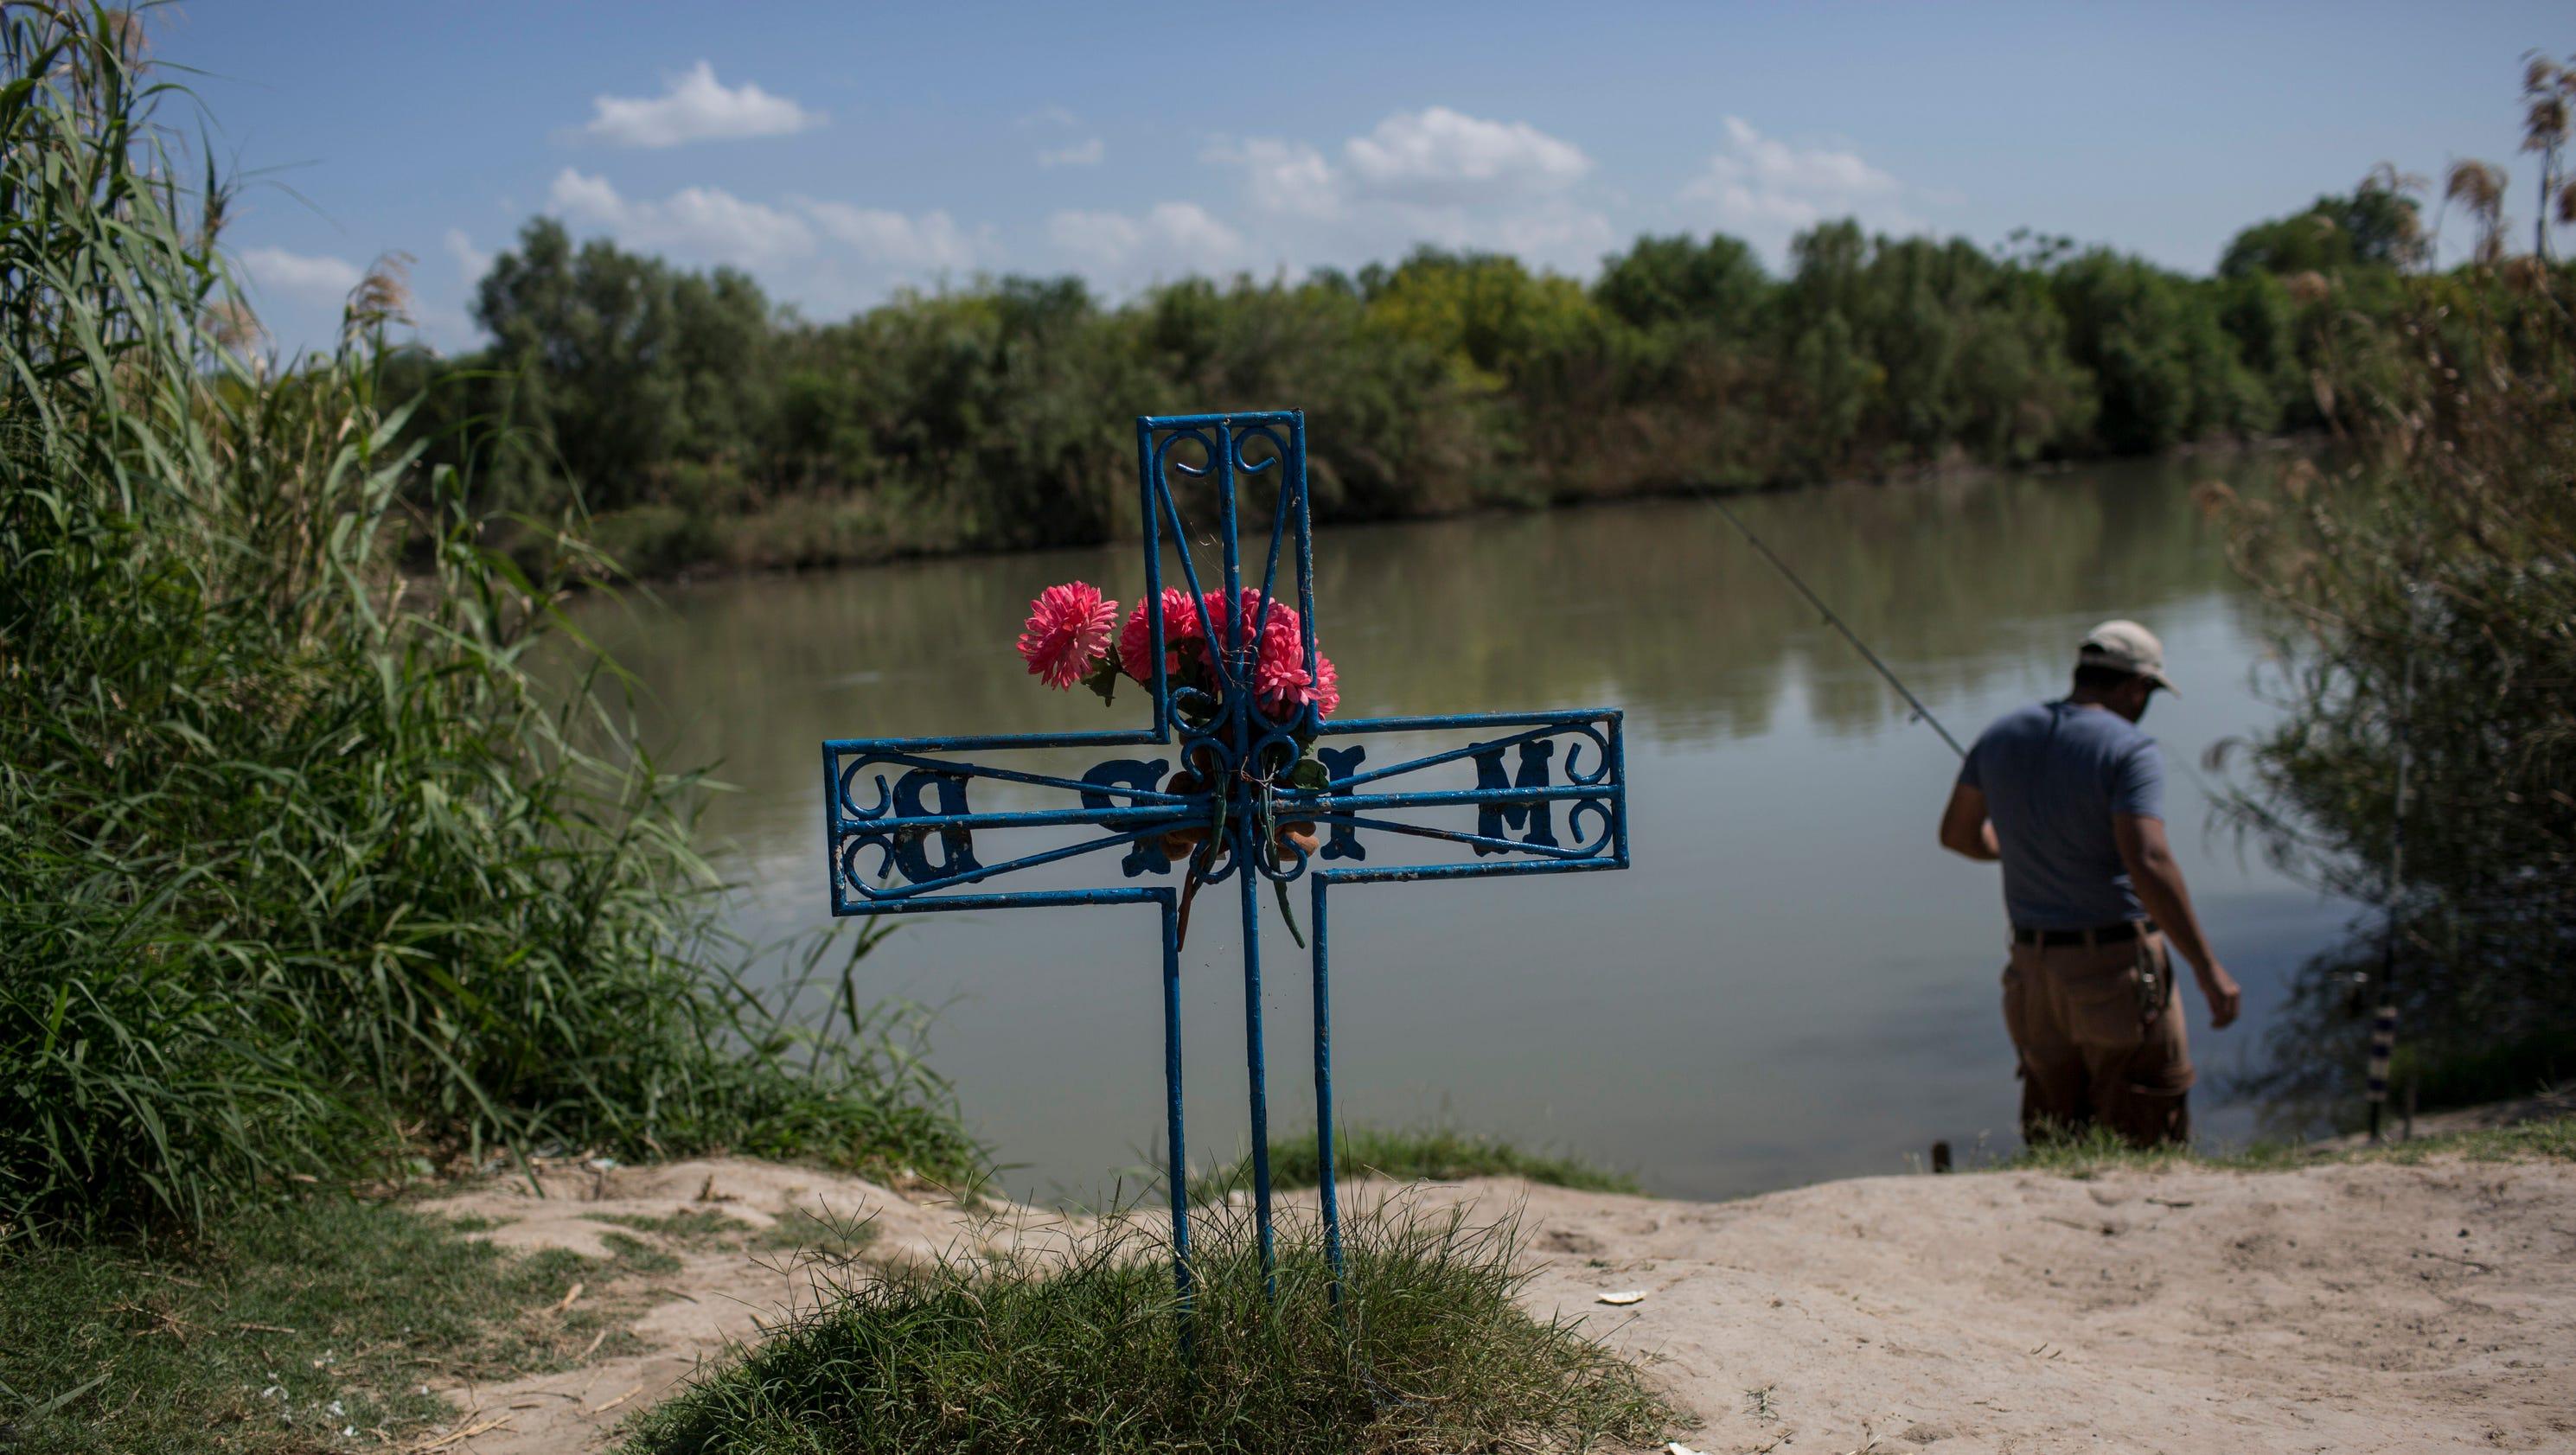 Migrant deaths increase on U.S.-Mexico border, U.N. says